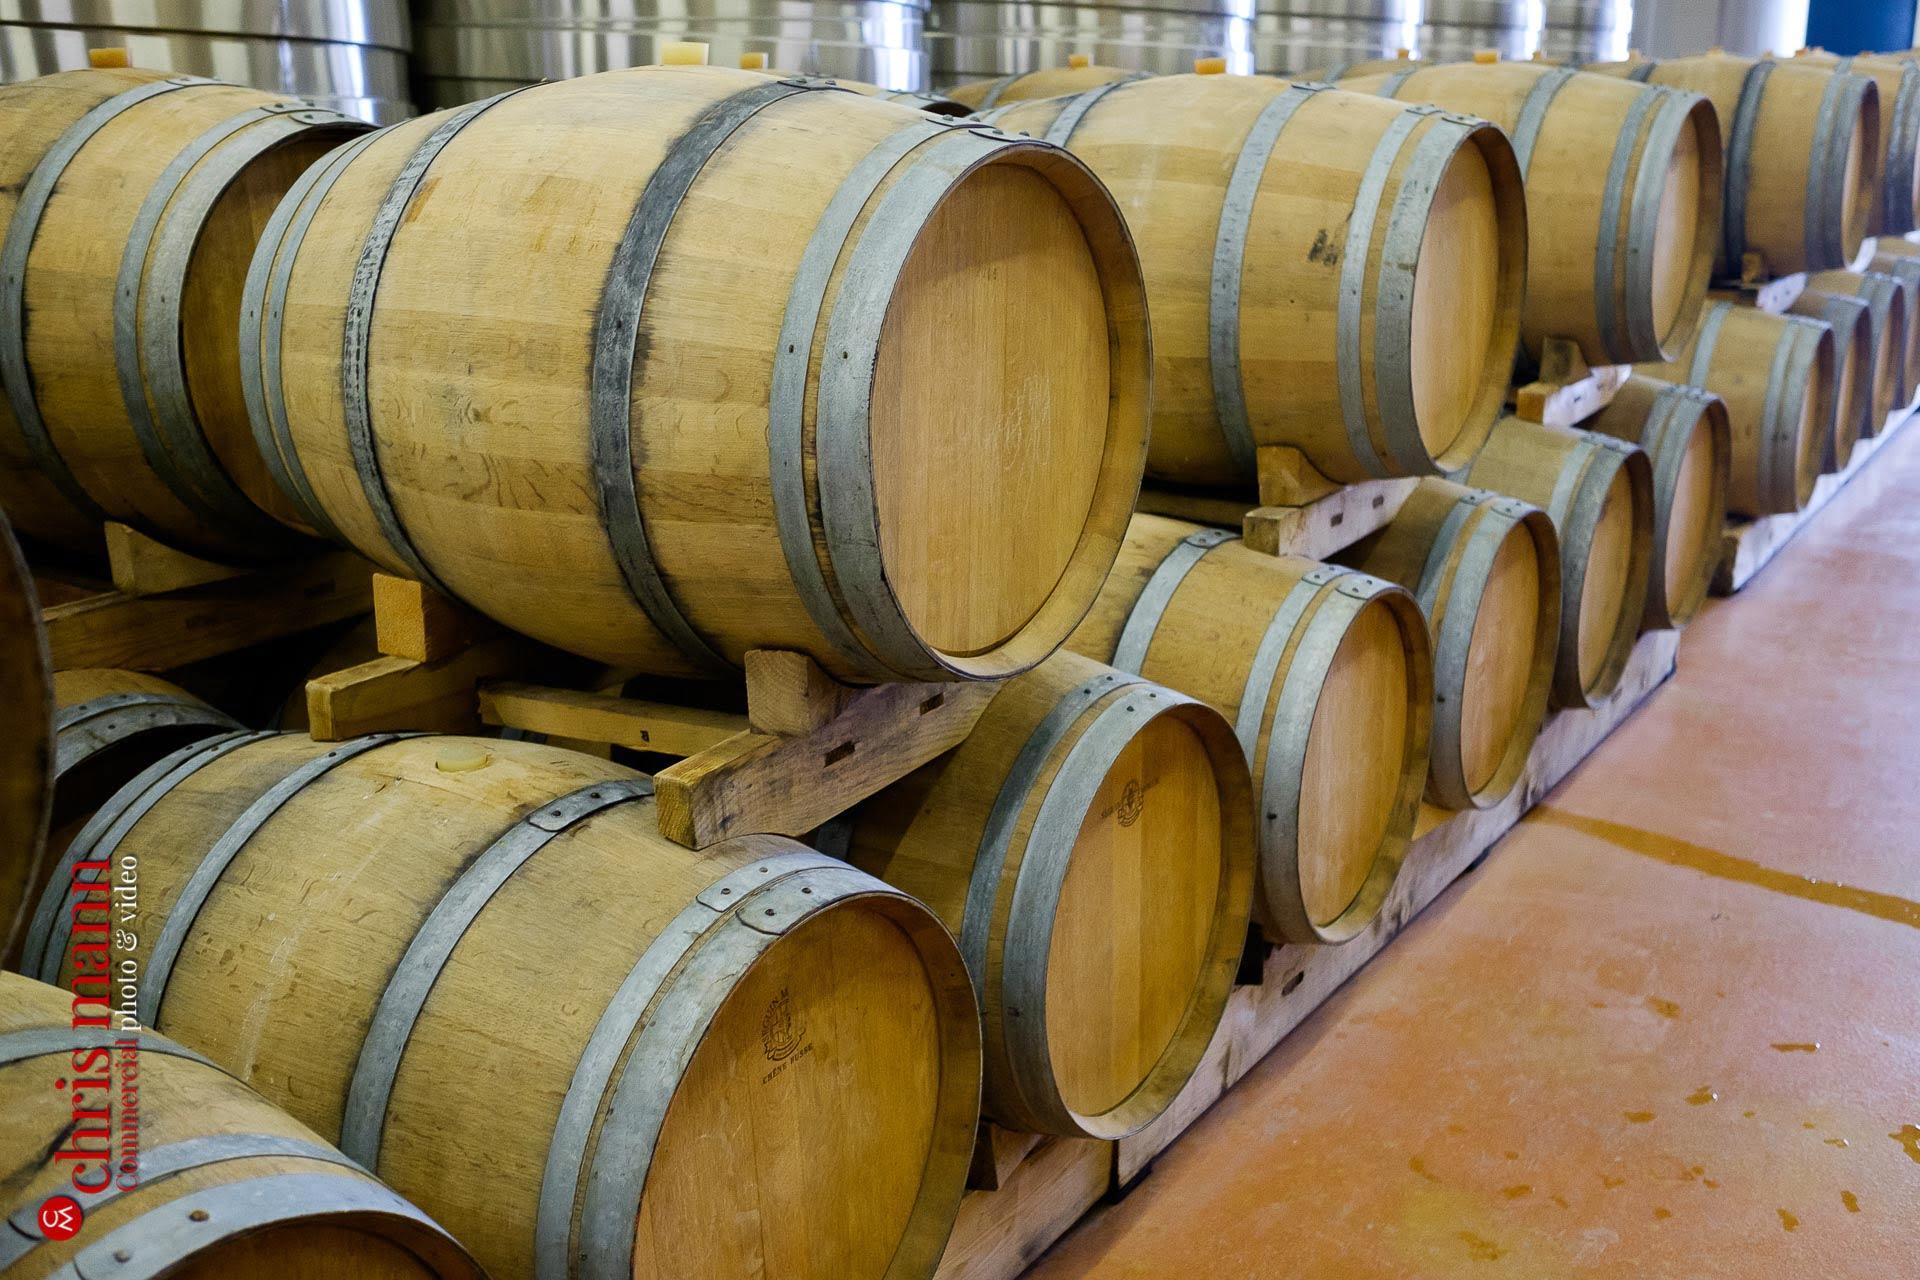 champagne casks at Bruno Paillard Reims France